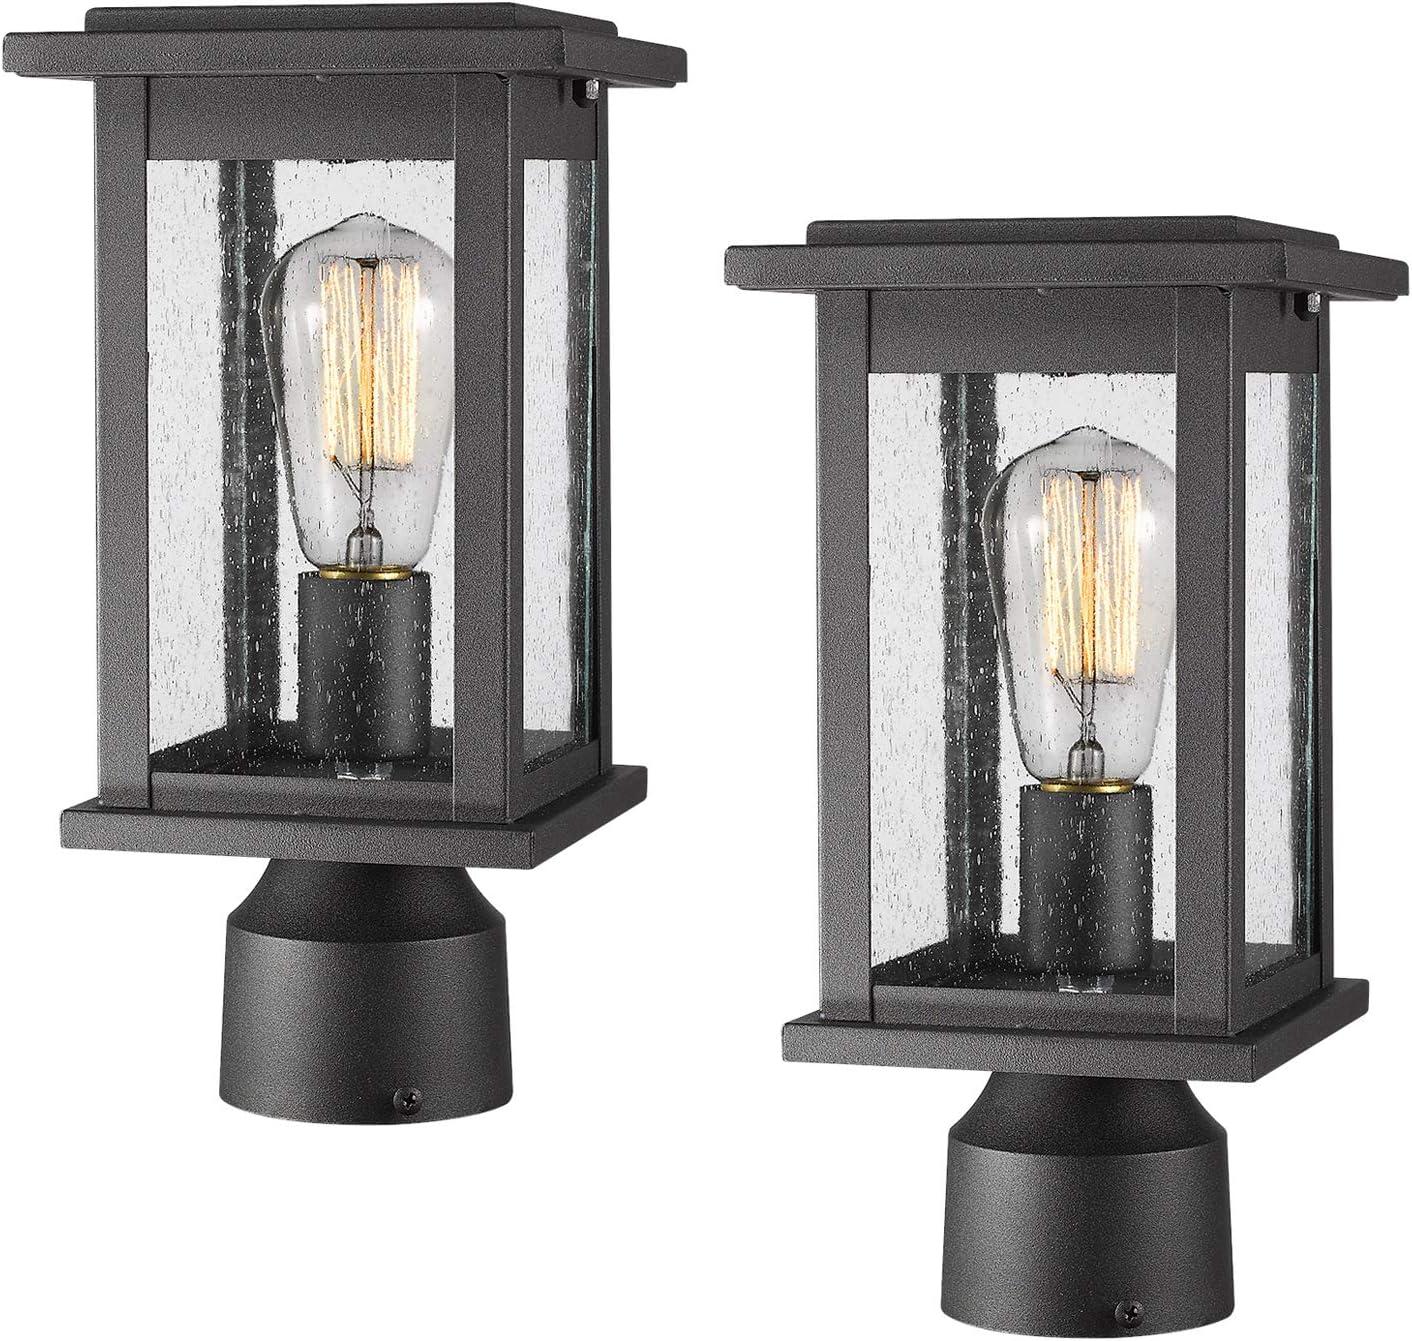 Emliviar Outdoor Post New Orleans Mall Light Fixtures Lig Popular product Exterior Pillar 2 Pack